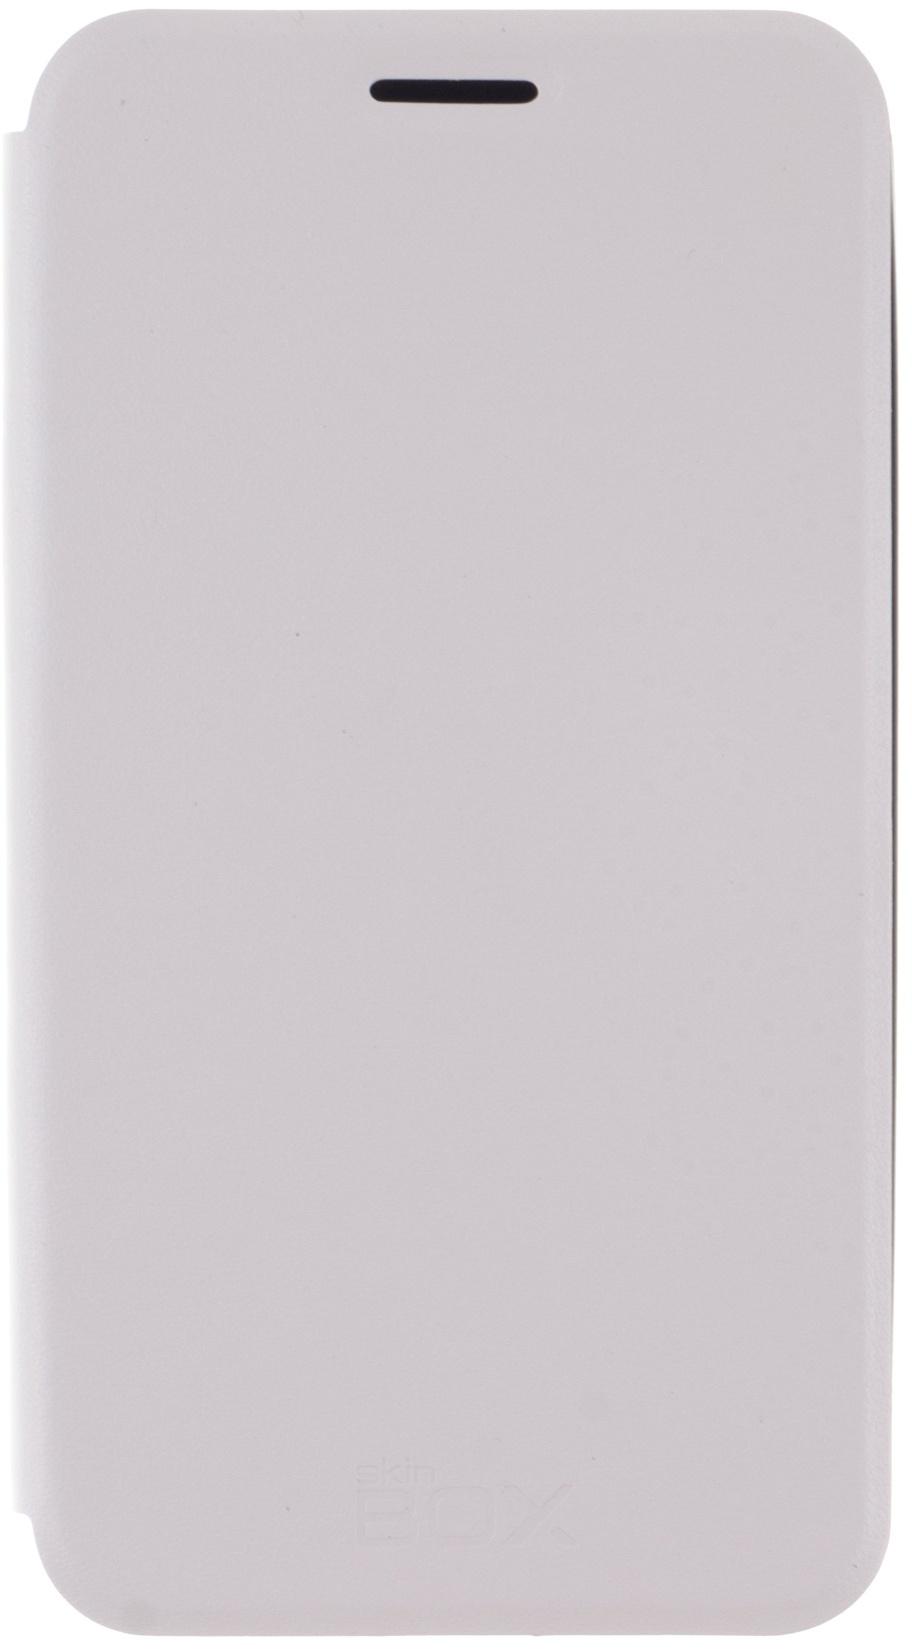 цена на Чехол для сотового телефона skinBOX Lux, 4630042525535, белый